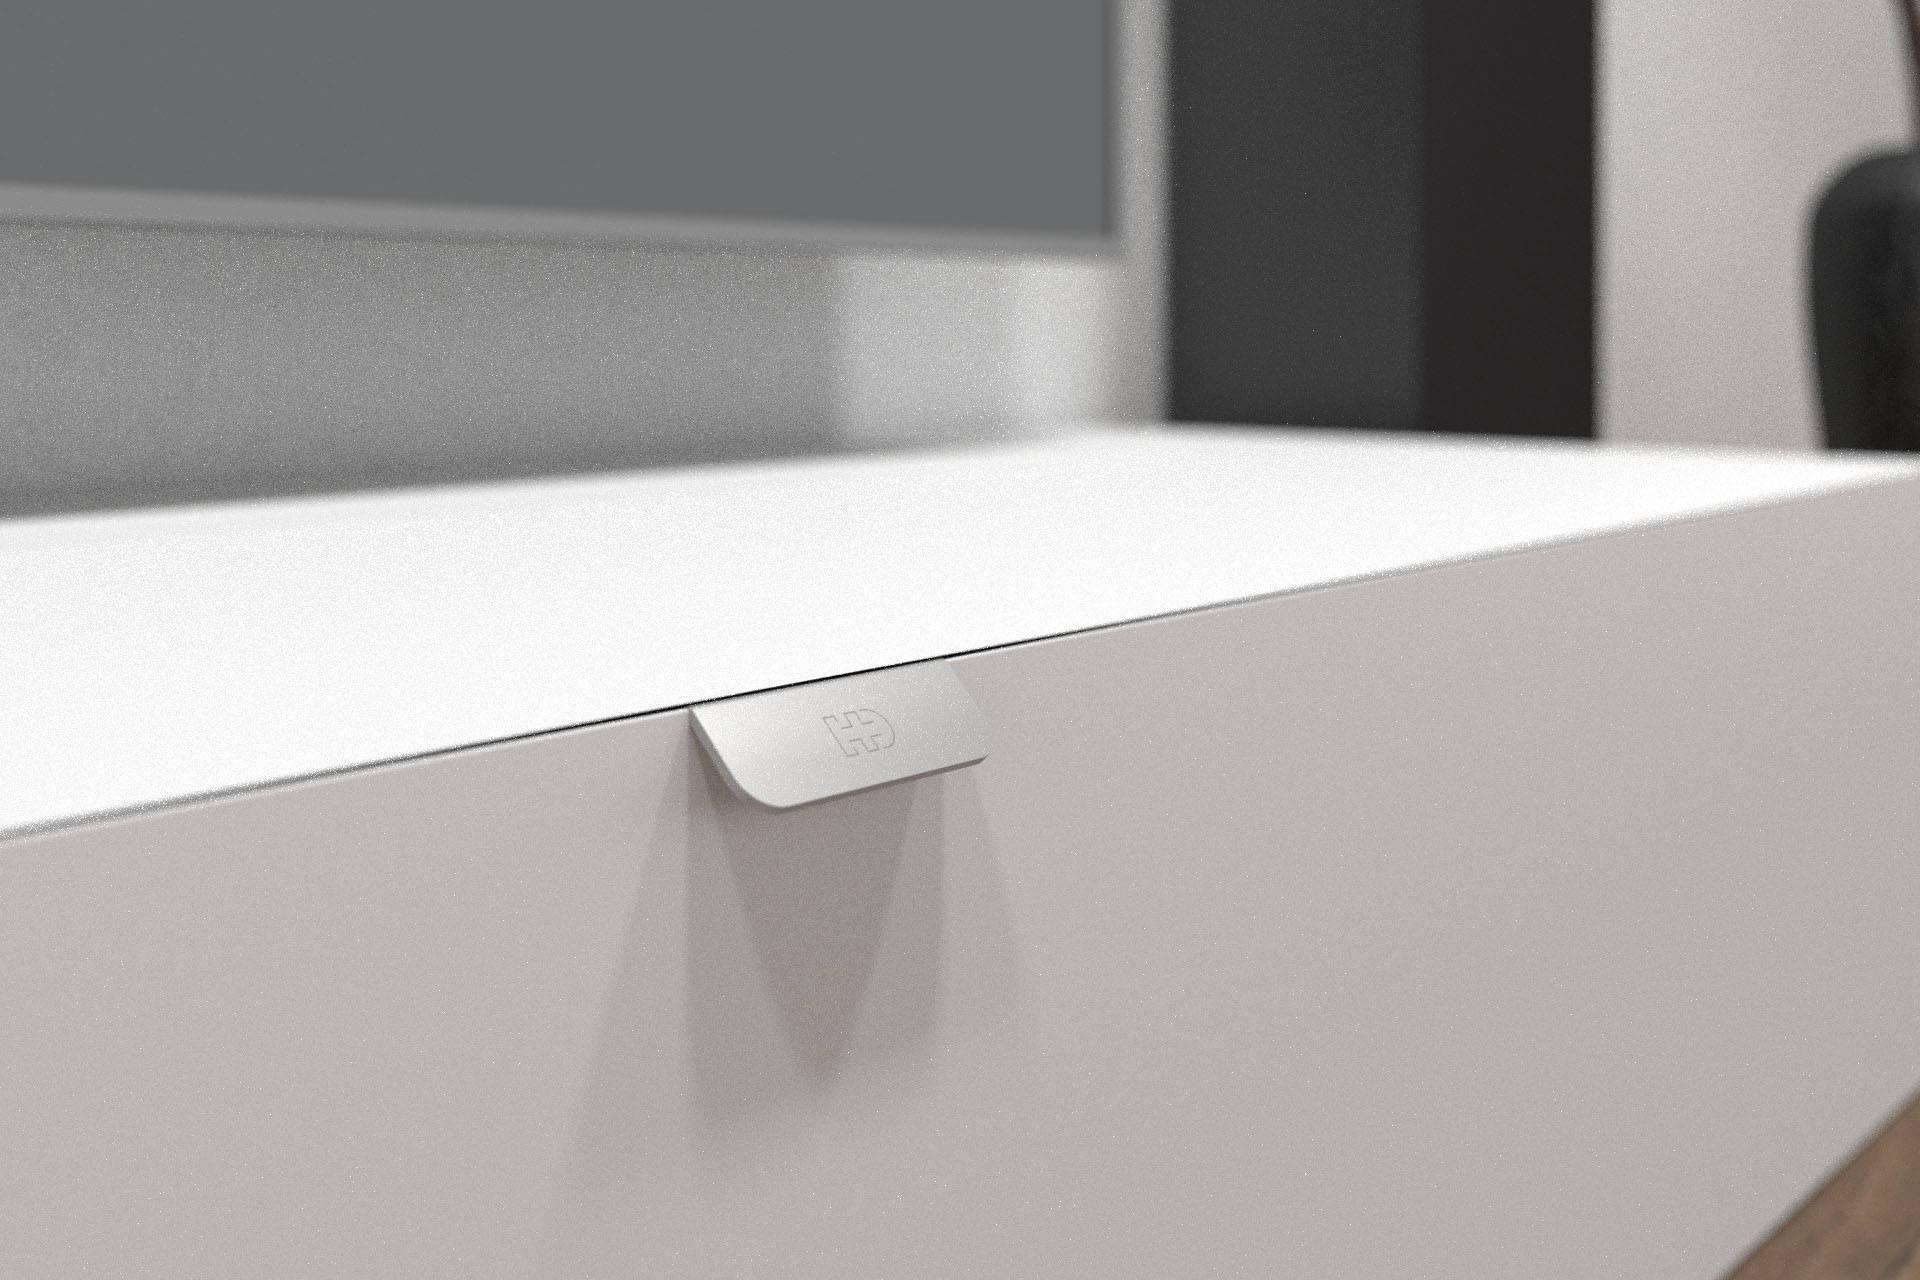 Hifi Design Möbel swisshd hifi tv möbel